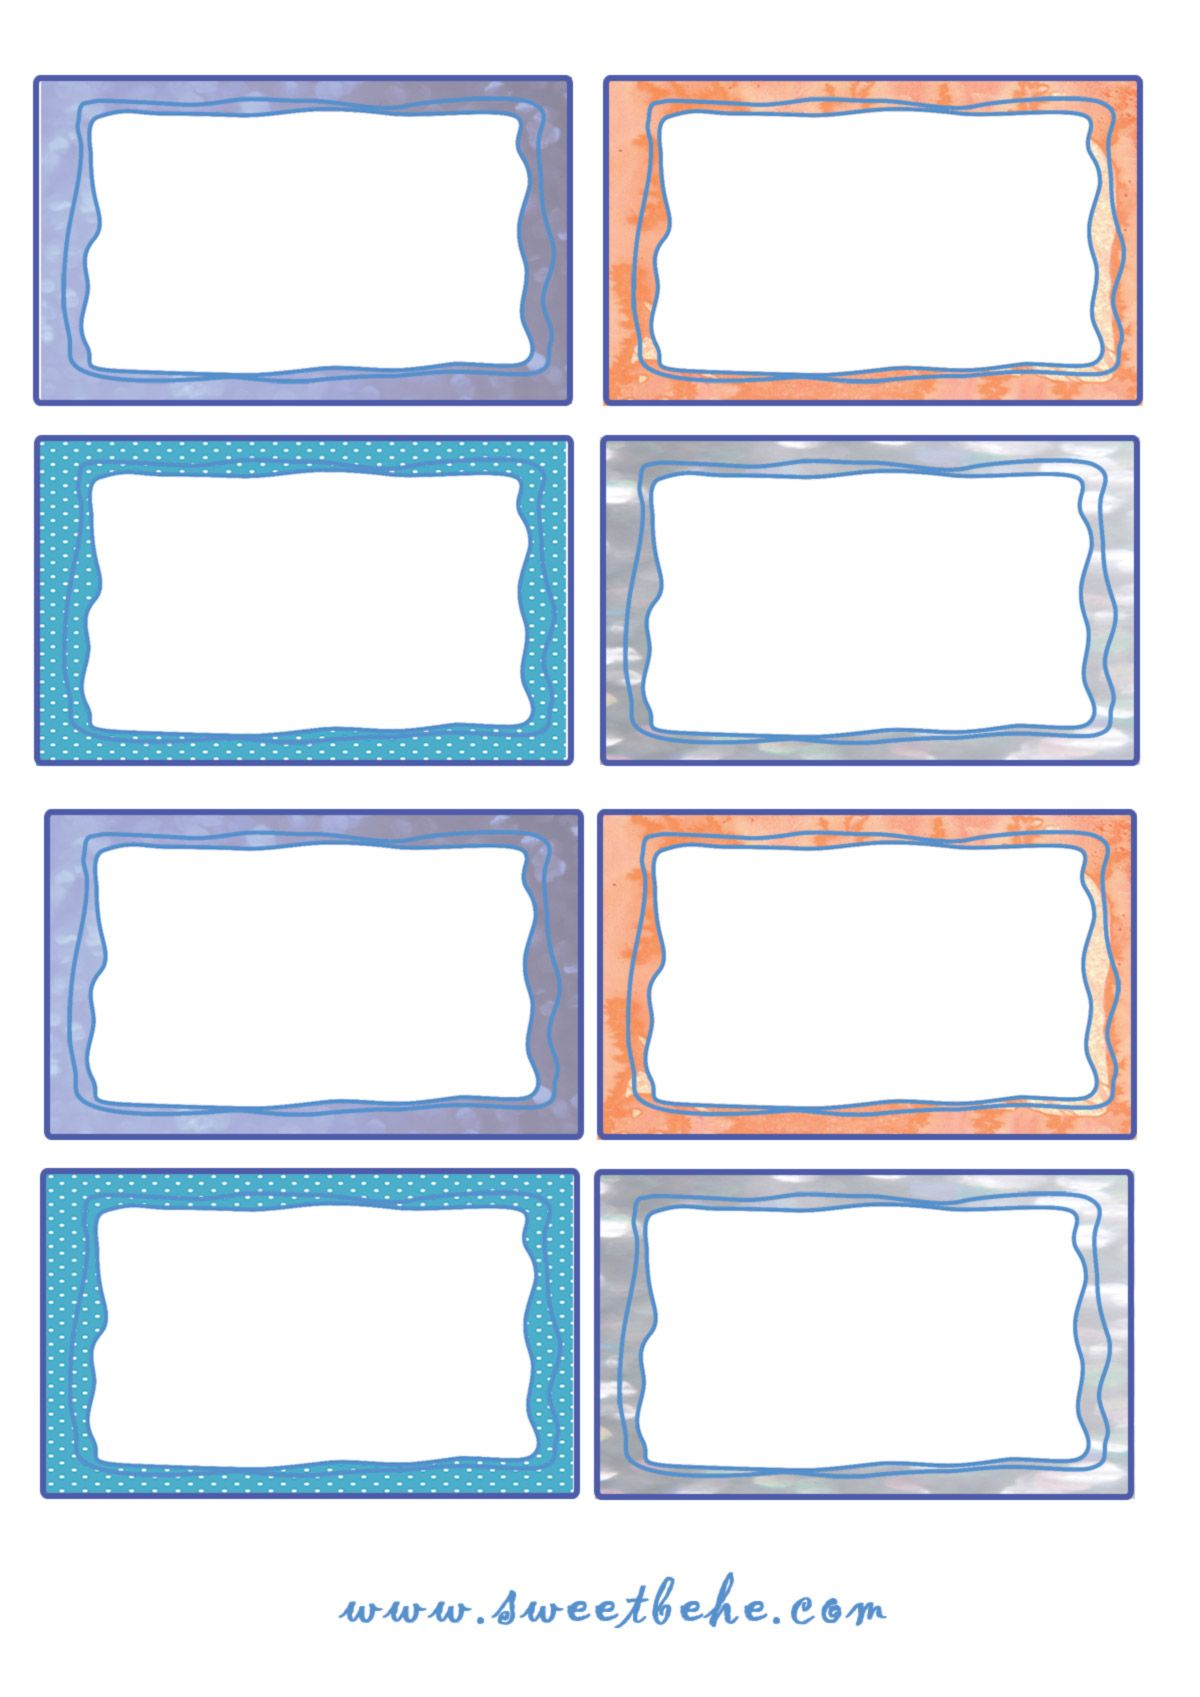 Super free printable} Etichette per libri e quaderni | matrica  HJ17